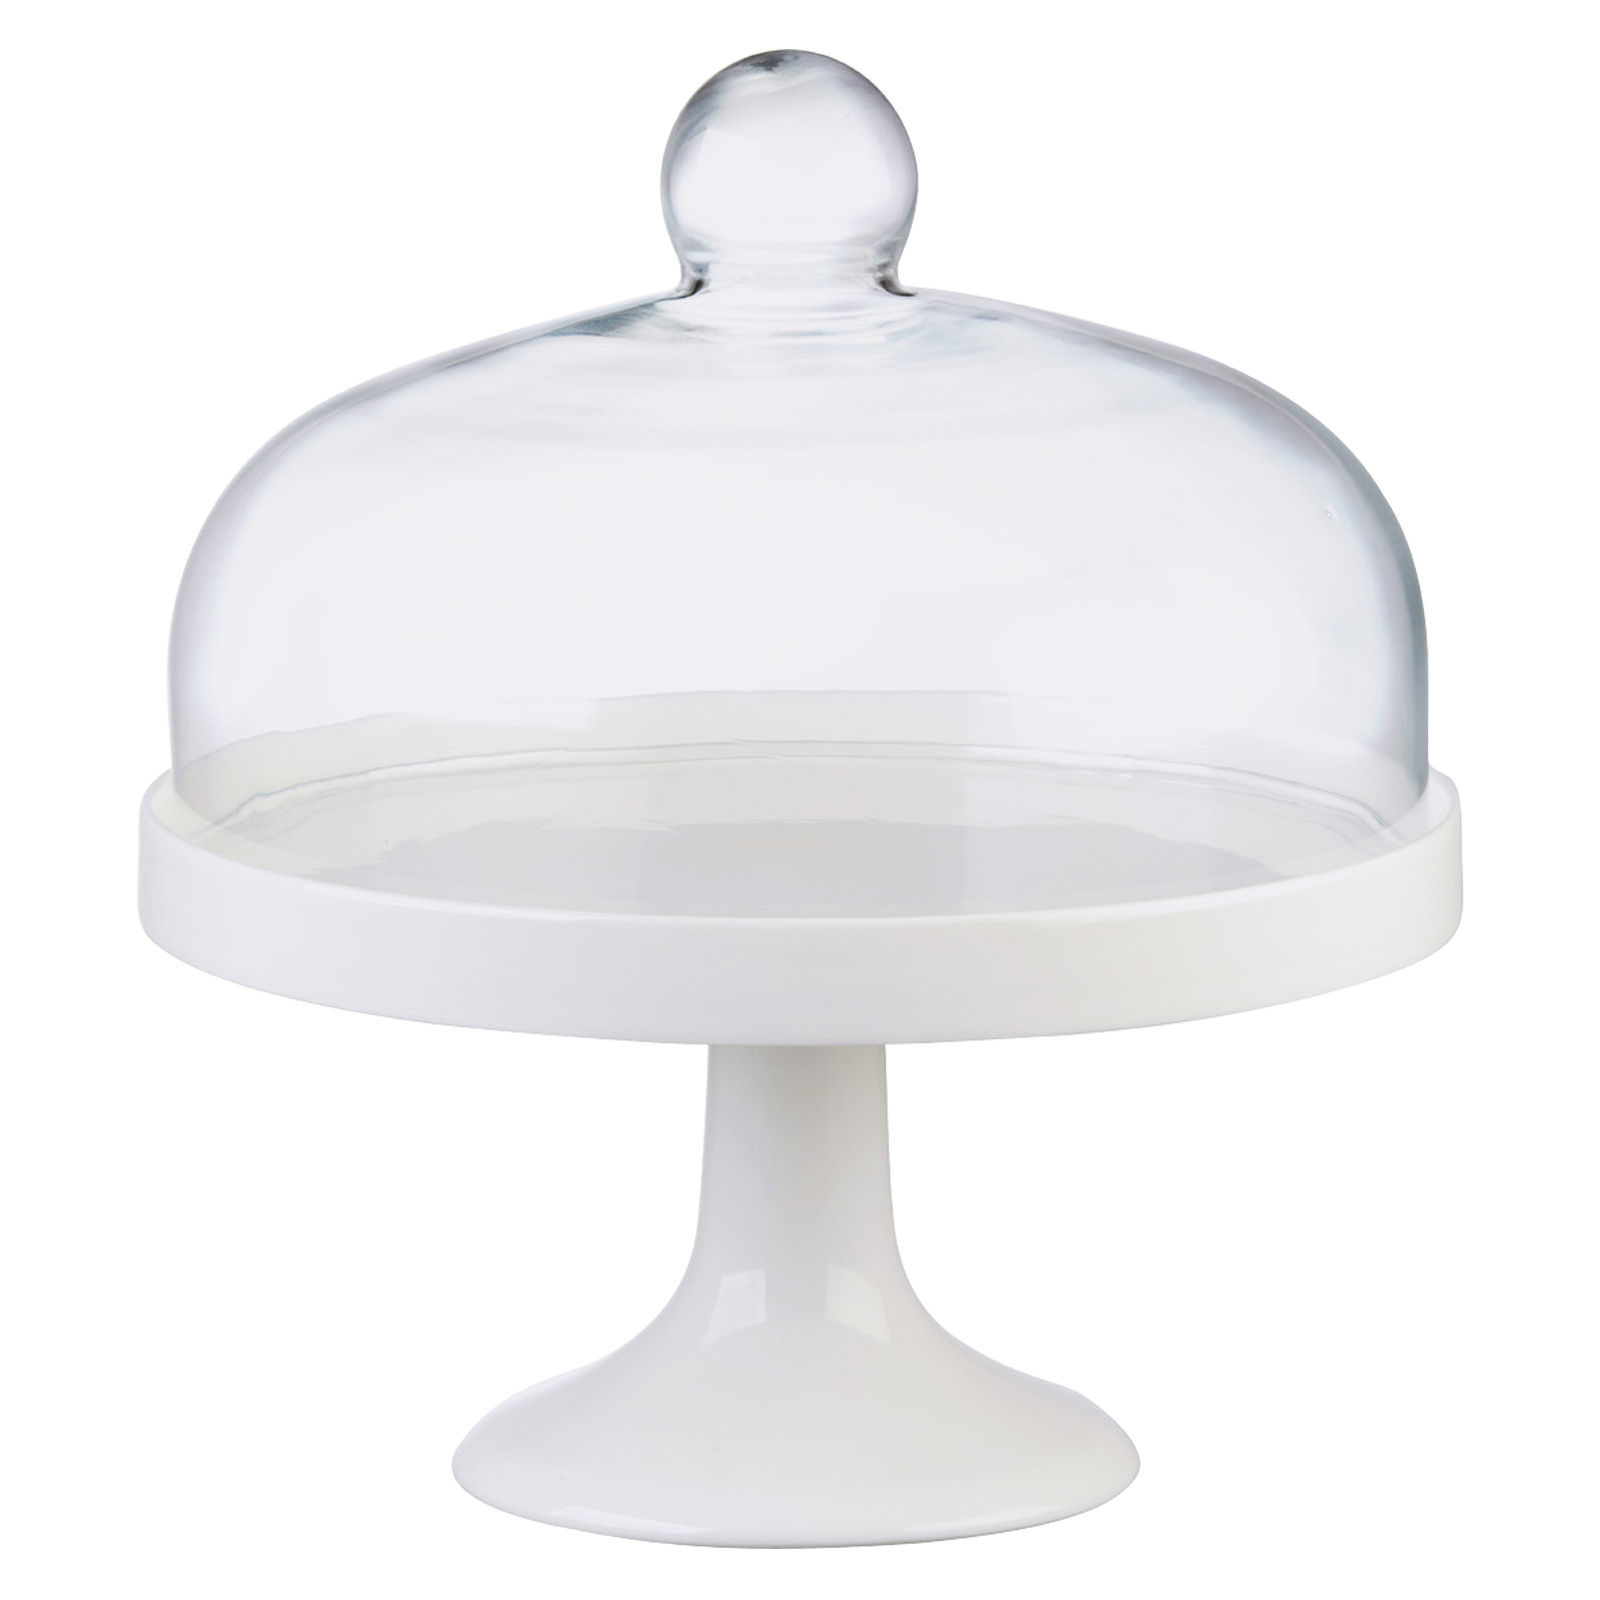 Elegance Cake Stand White - Complete Set